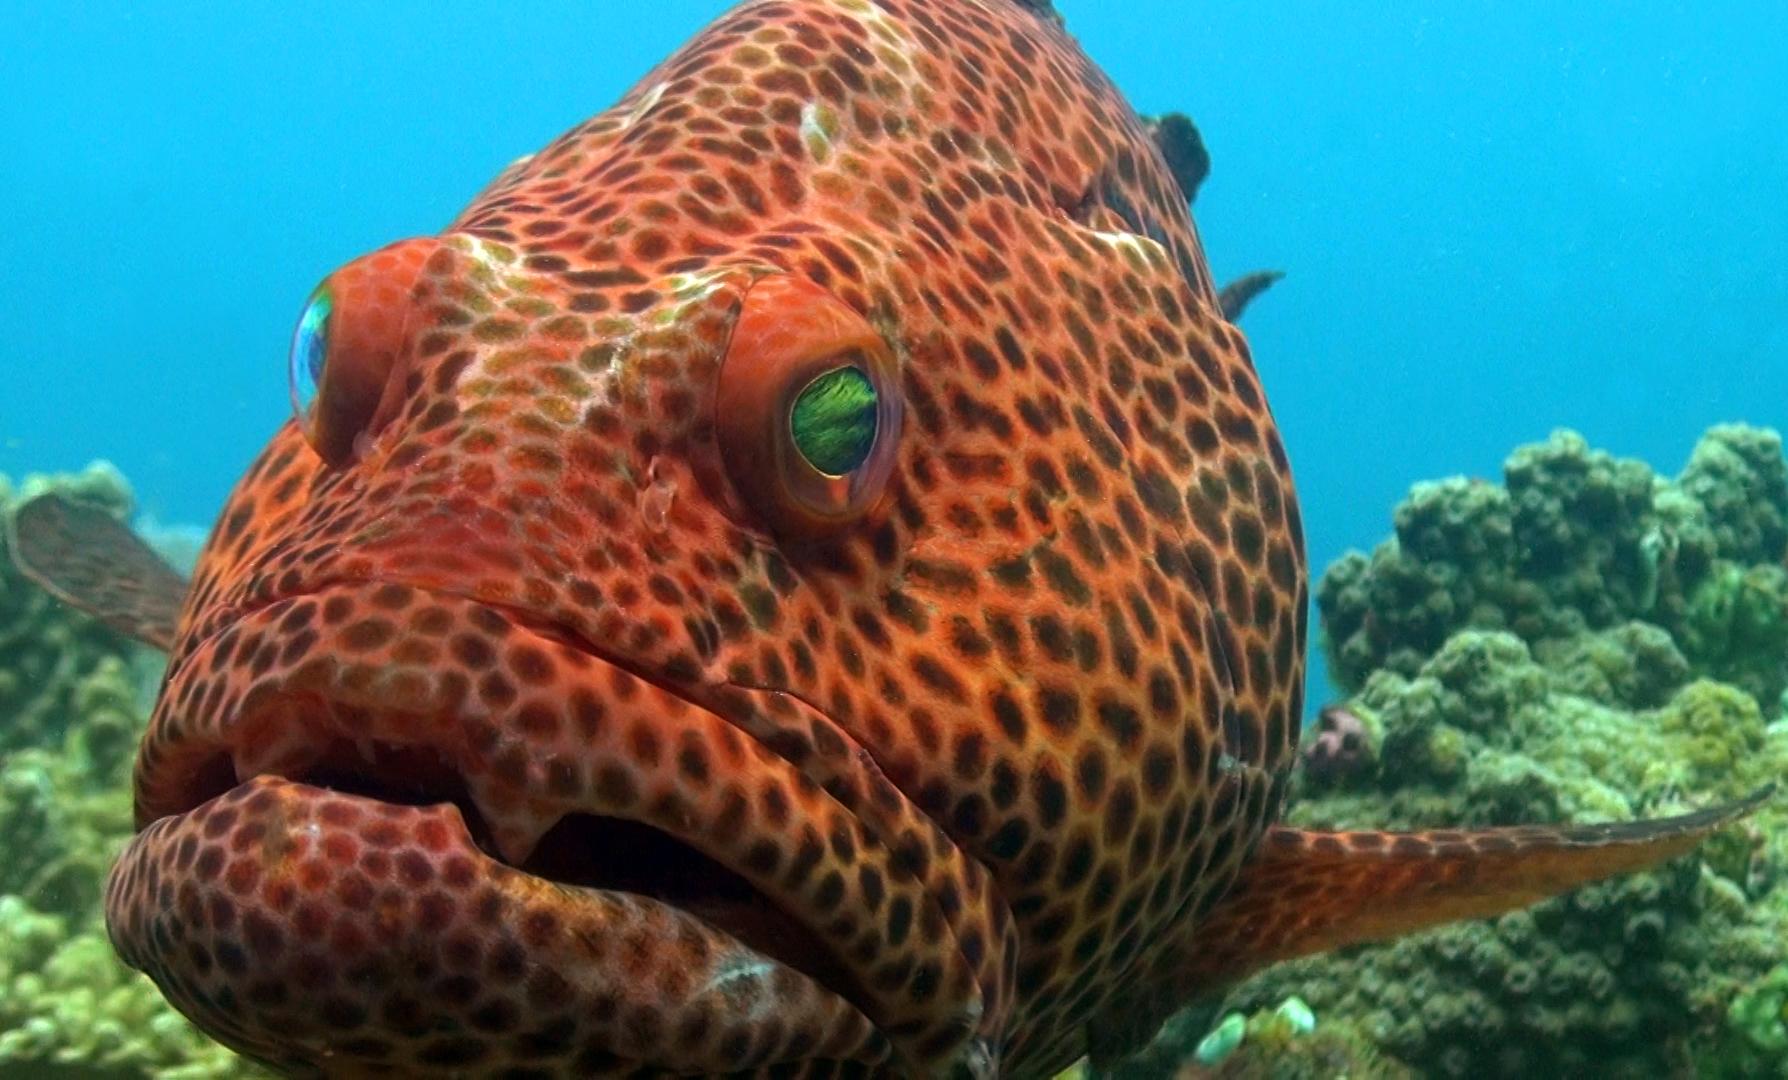 GROUPER CREDIT: Bark Lukasik / coral reef image bank